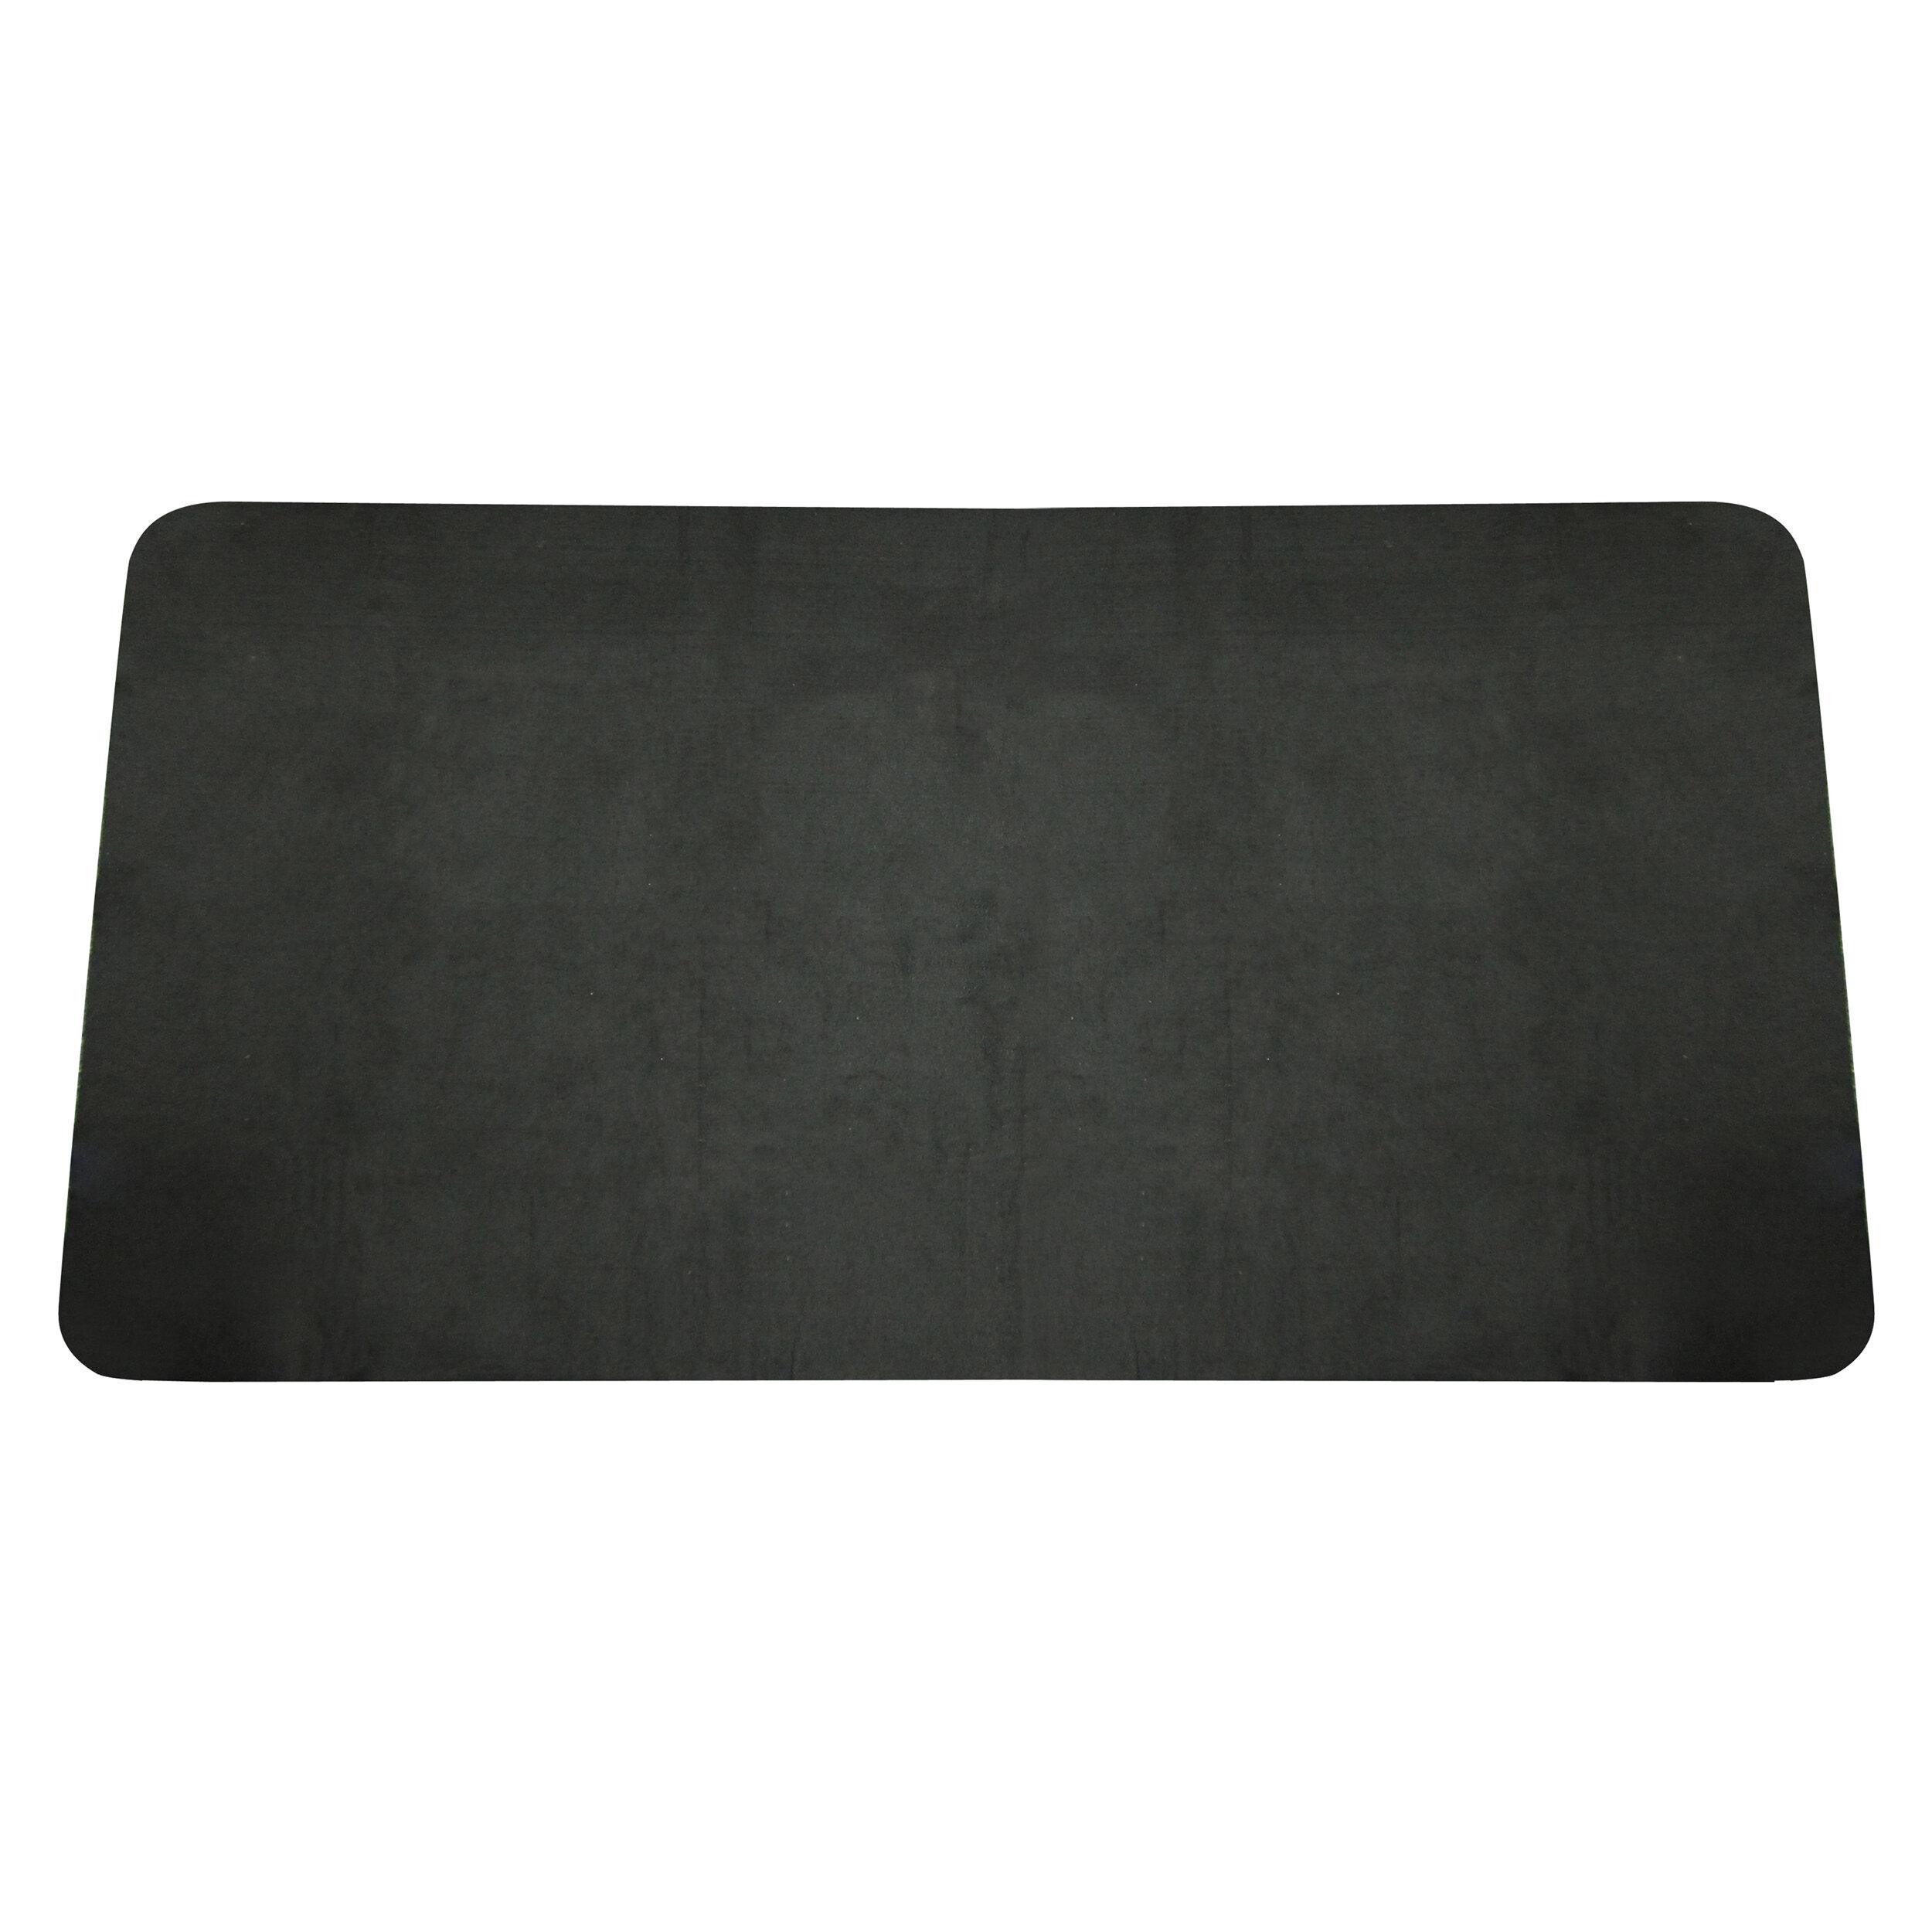 anti walmart gelpro grasscloth java mats standing mat extreme fatigue ip by com newlife comfort